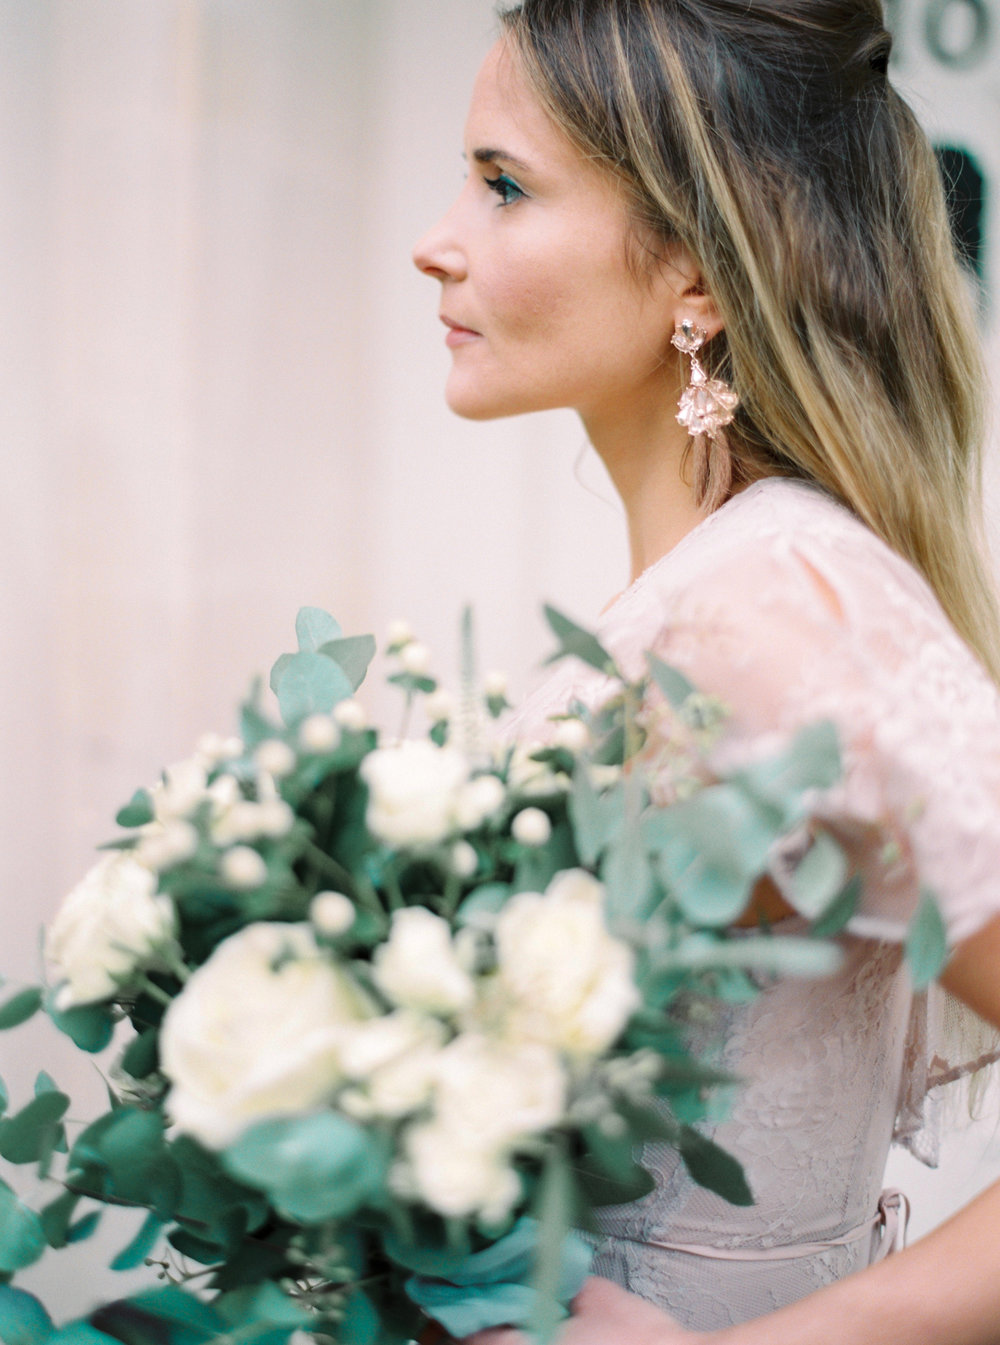 Luxury Wedding Planner UK | Our Chic & Romantic Engagement Shoot in Bath | Katie Julia Photography - 25.JPG